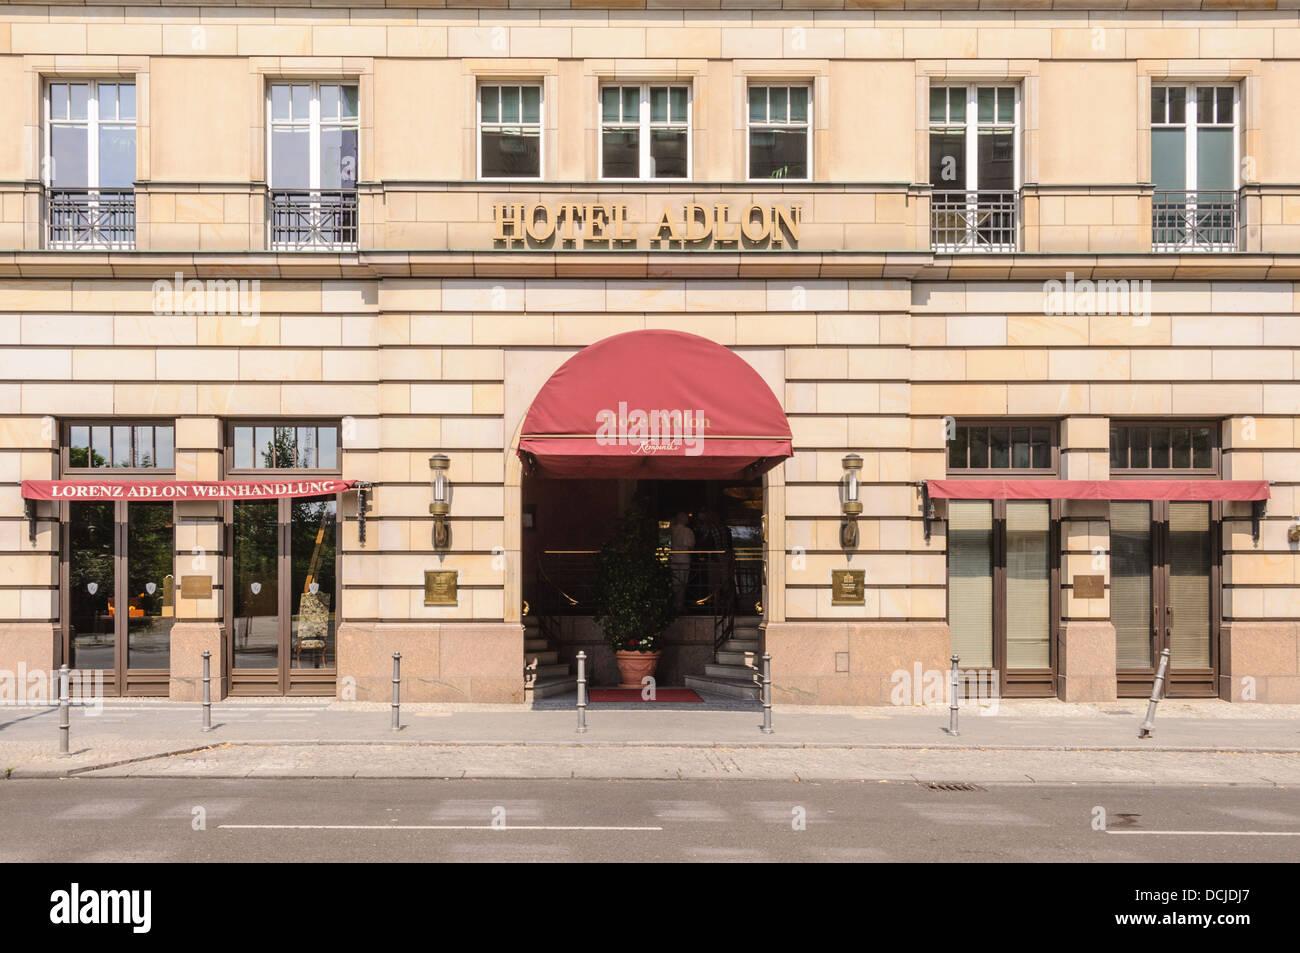 Rear entrance of the Hotel Adlon Kempinski and wine shop Lorenz Adlon Weinhandlung - Berlin Germany Stock Photo